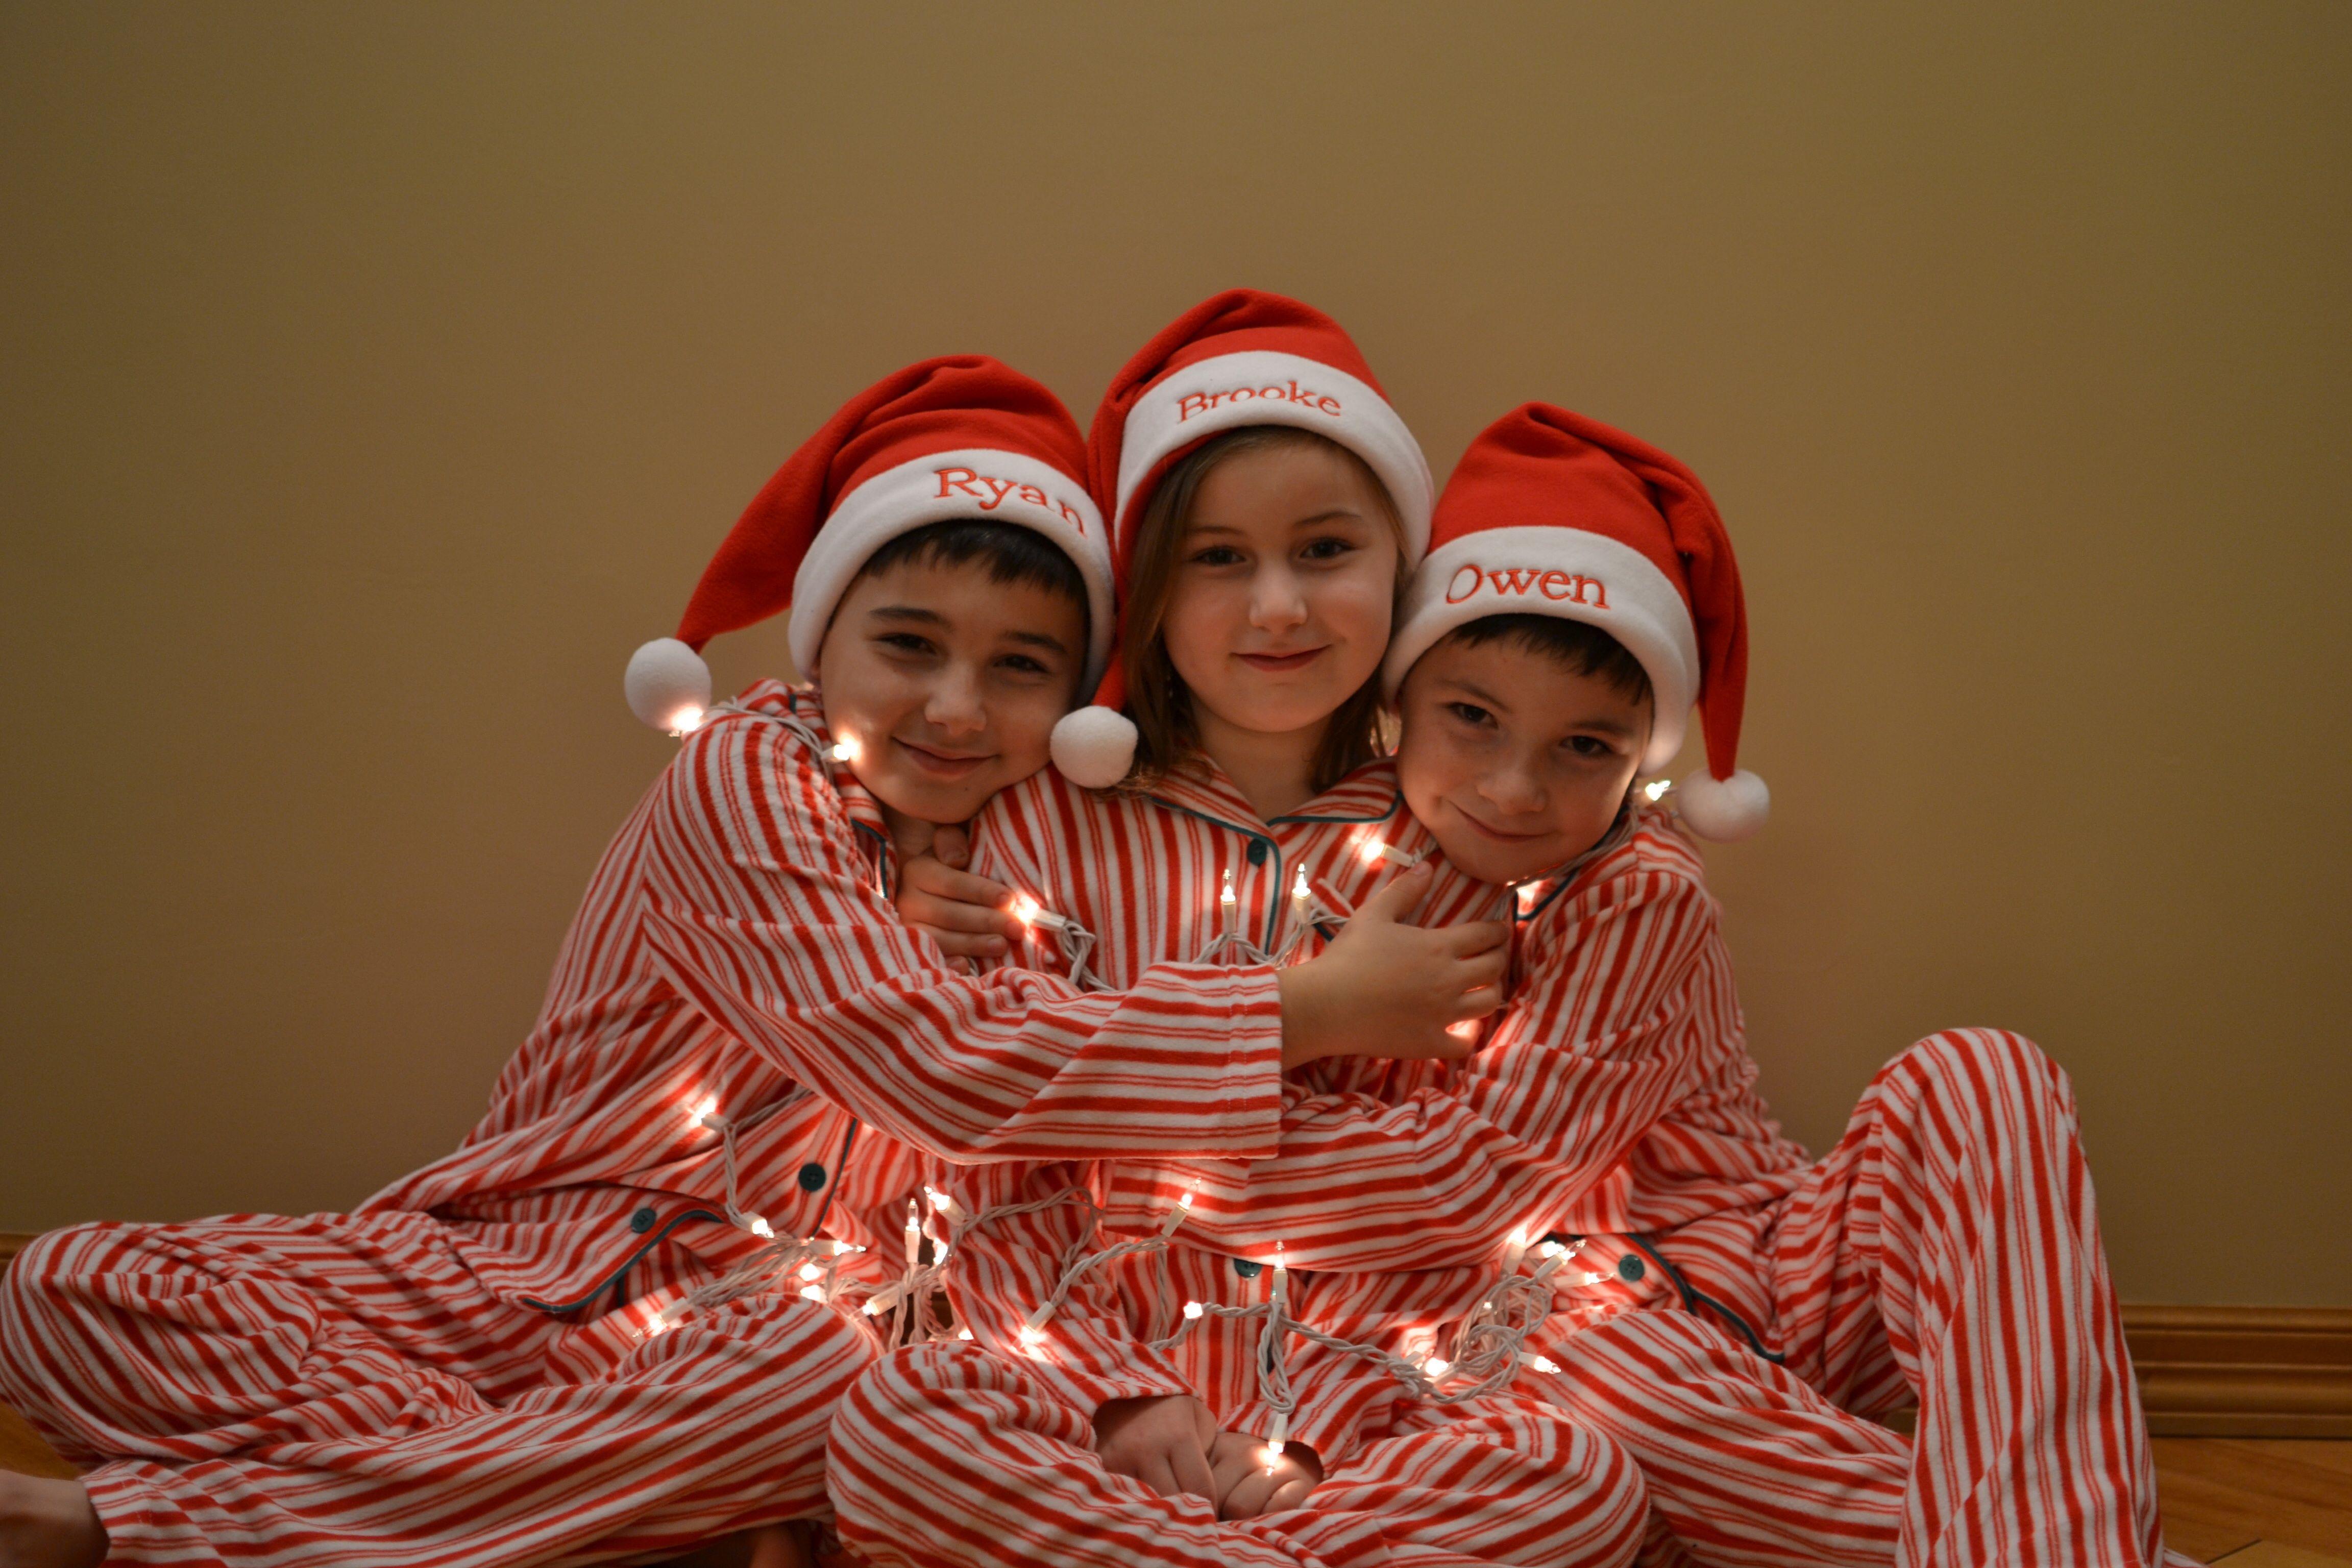 Candy Cane Fleece Matching Family Pajamas Matching